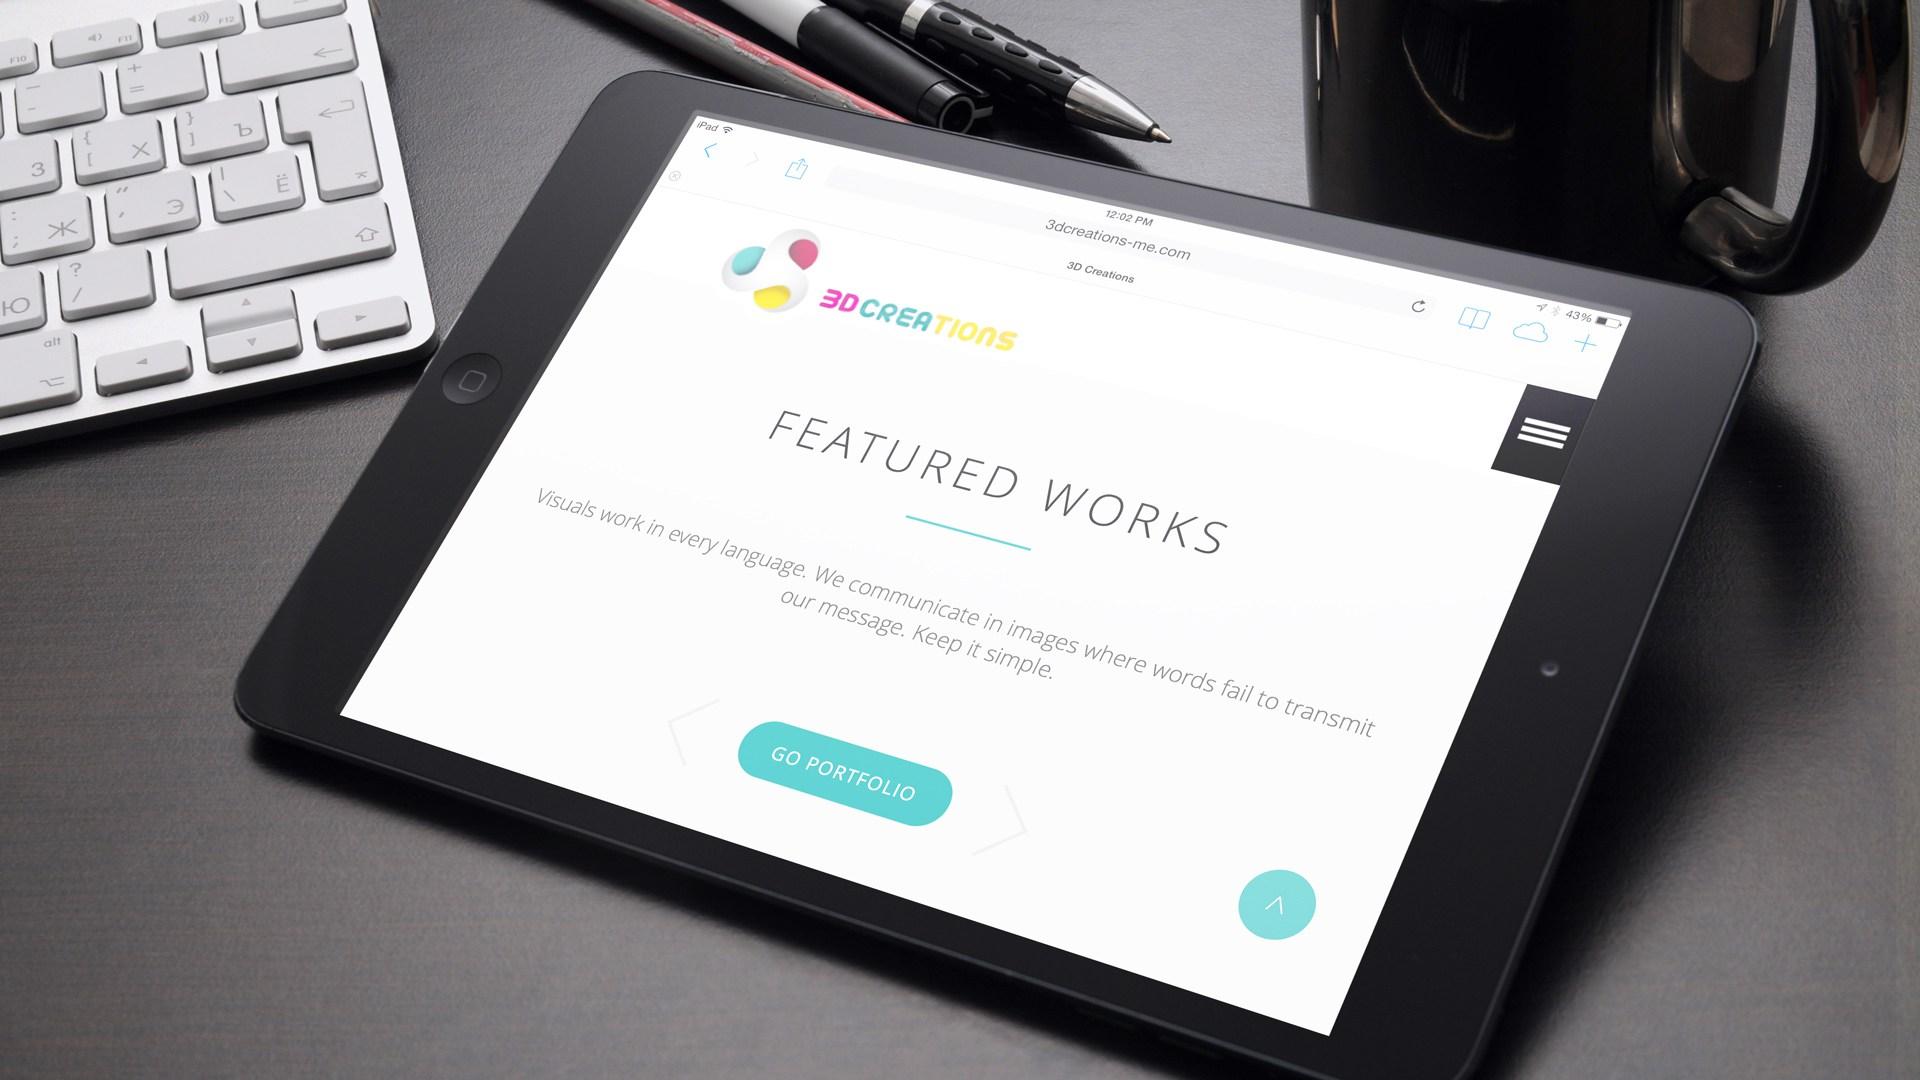 3d-creations-website-tablet